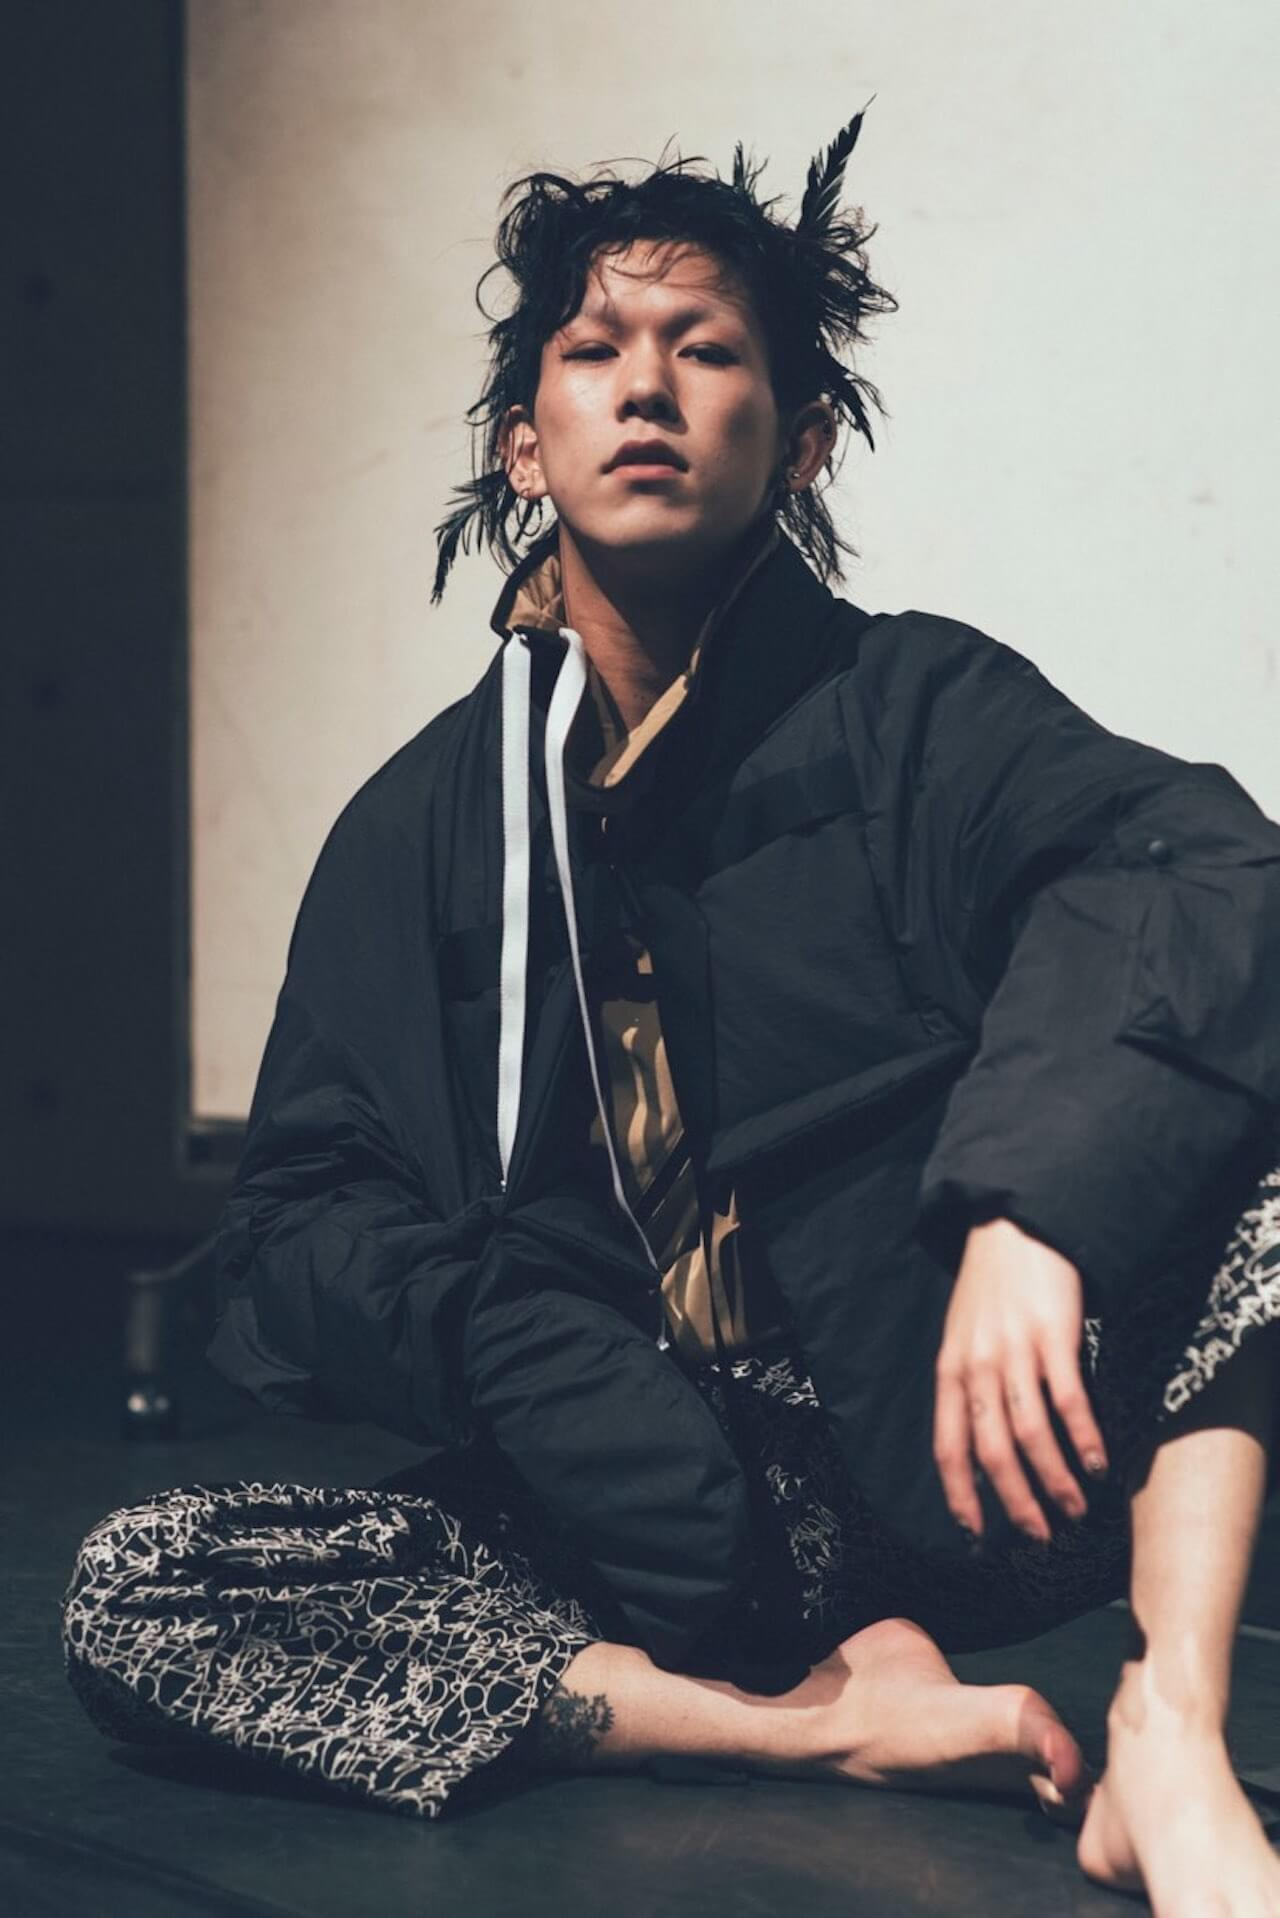 Lehの2020年秋冬コレクションがリリース|イメージモデルに山川冬樹、shimizu mash、elena midoriを起用。コレクションの撮影は水谷太郎。 life_fashion200913-leh-romantic-2-1